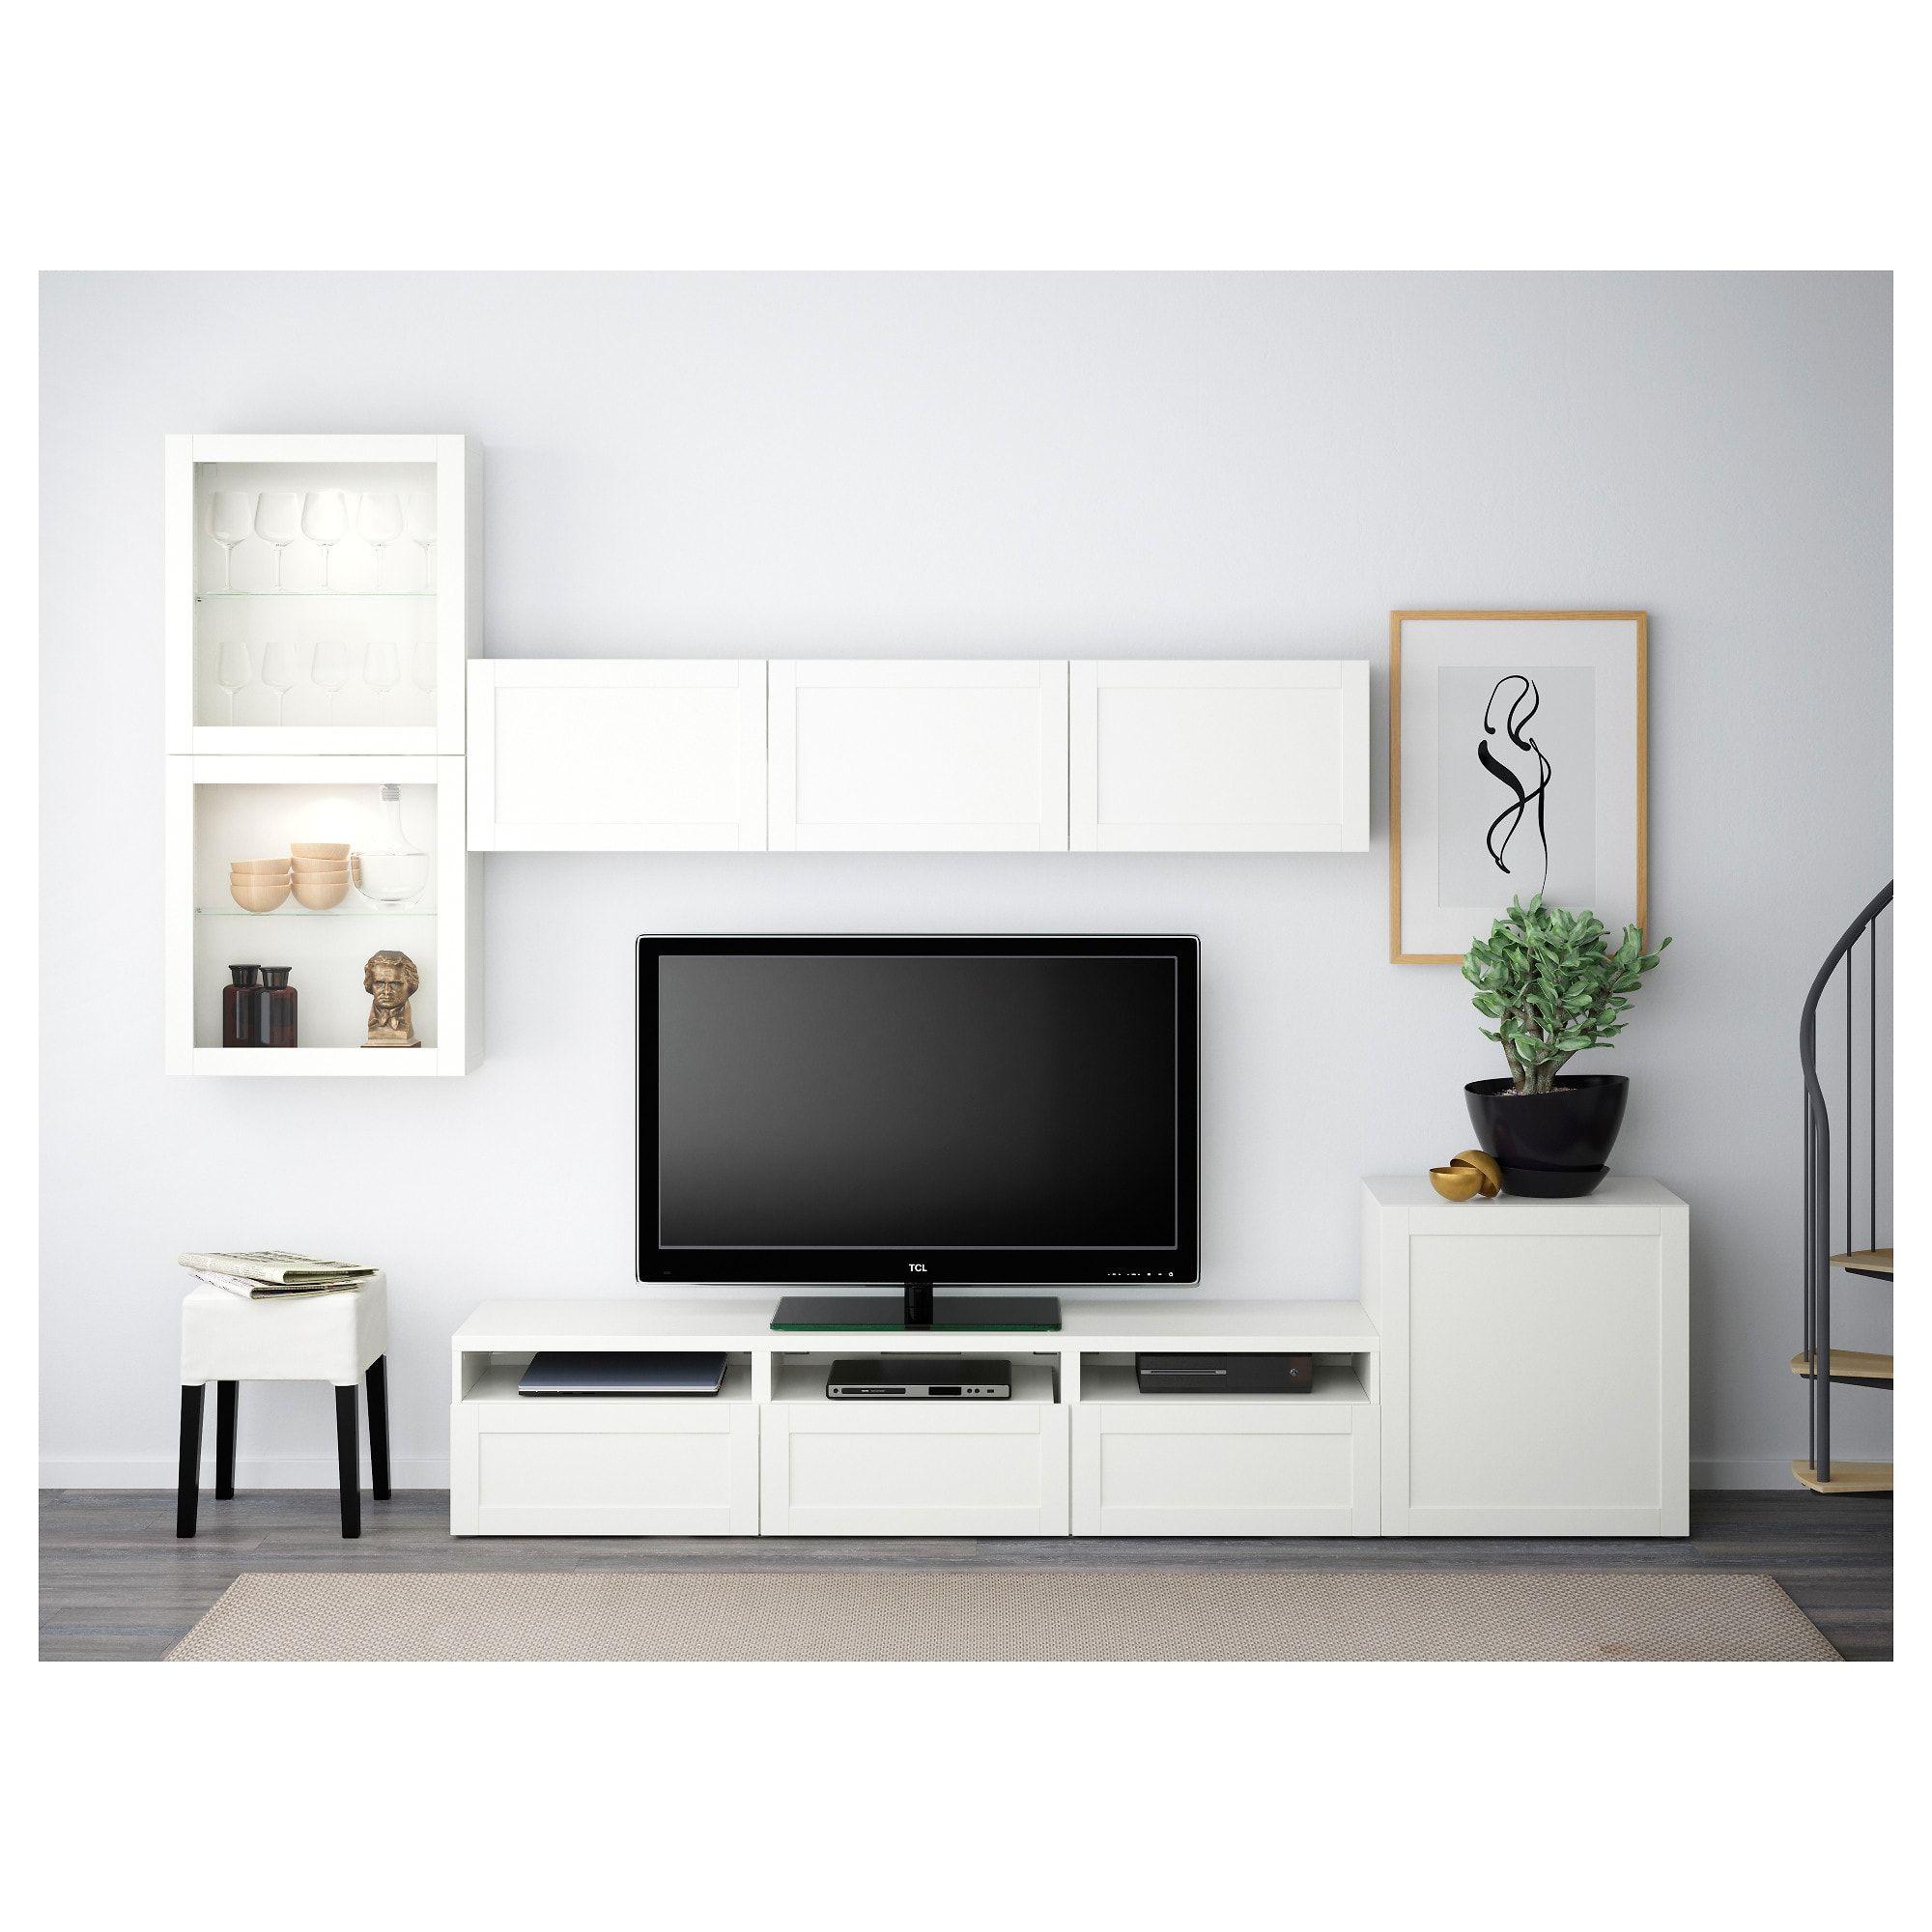 Besta Tv Storage Combination Glass Doors Hanviken Sindvik White